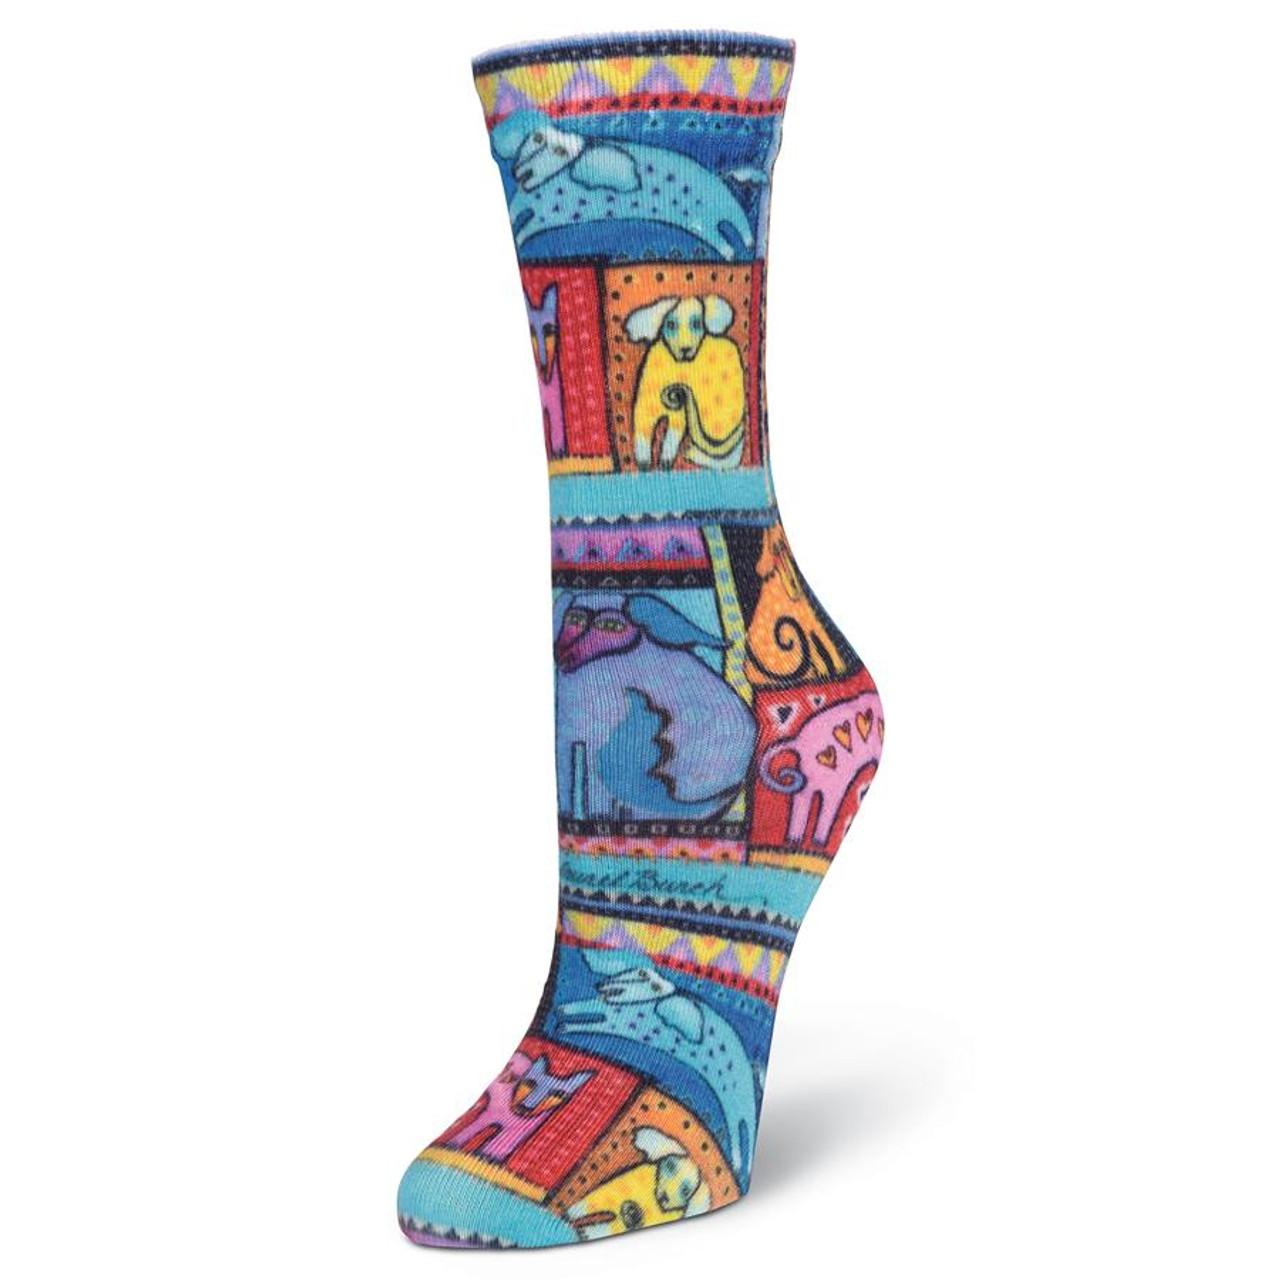 Laurel Burch Black Blue Dog /& Doggy Ladies Womens Crew Cotton BLend Socks New